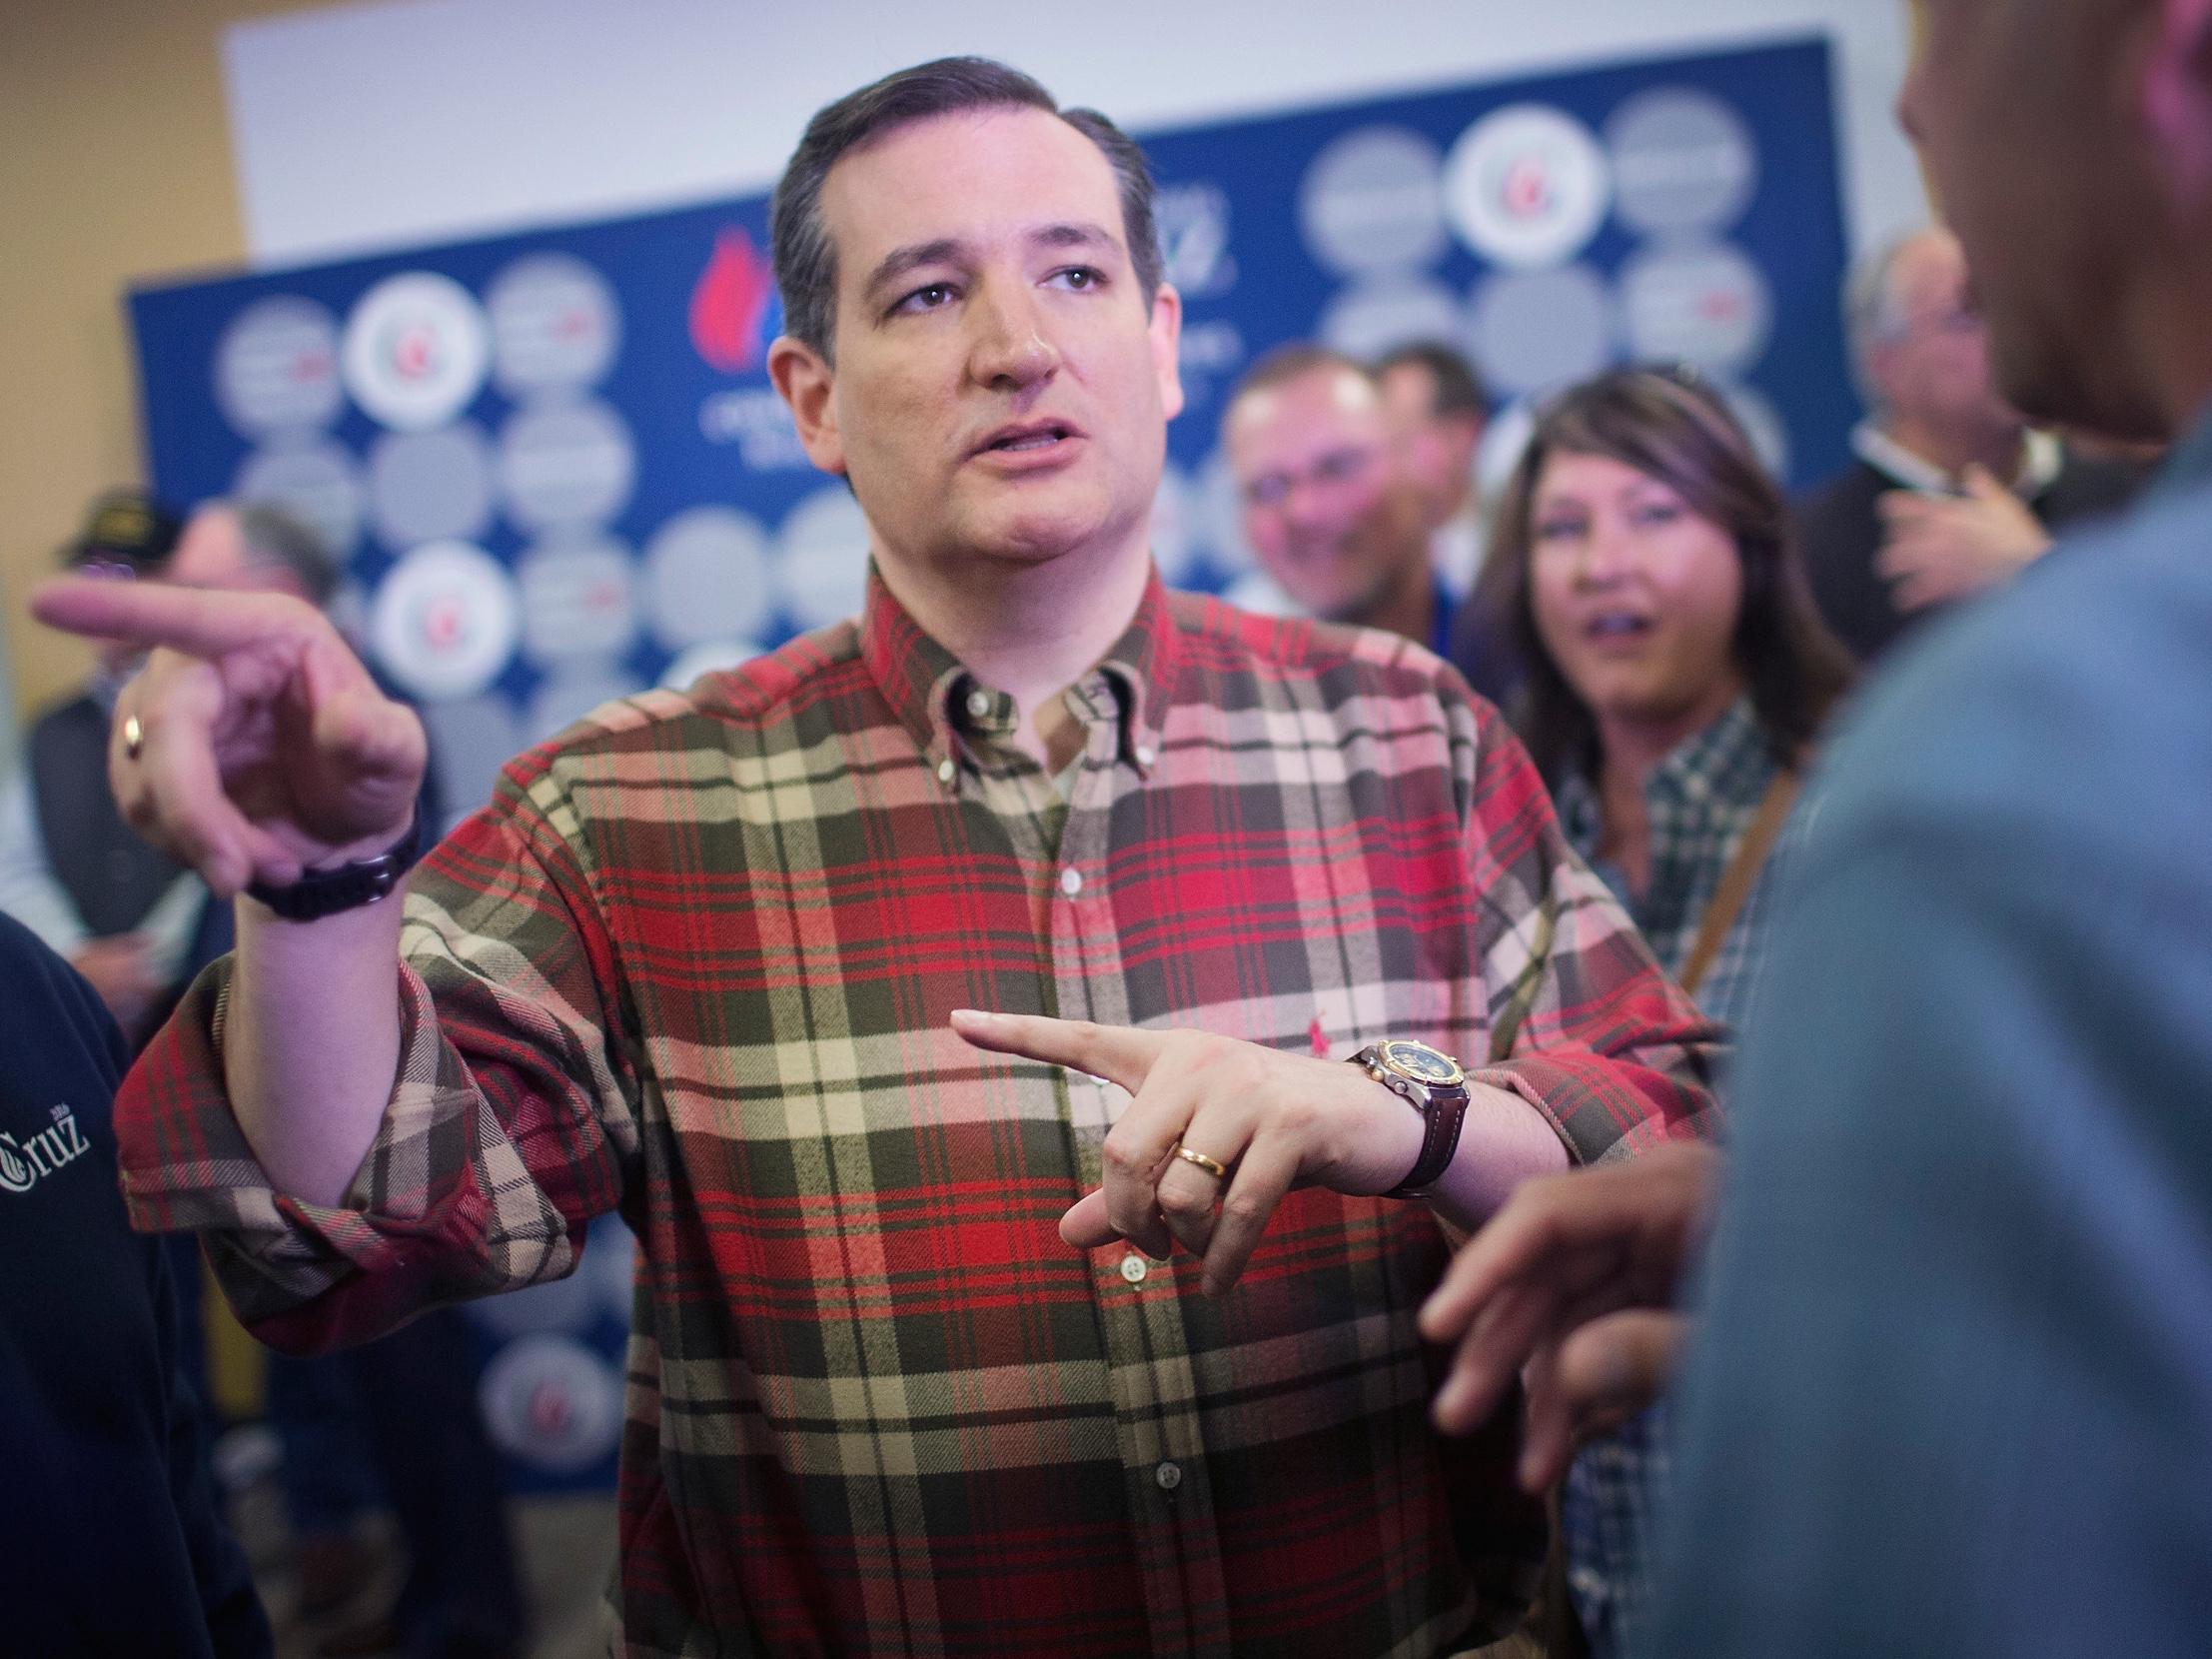 Ted Cruz Holds Second Amendment Campaign Event At Iowa Gun Range